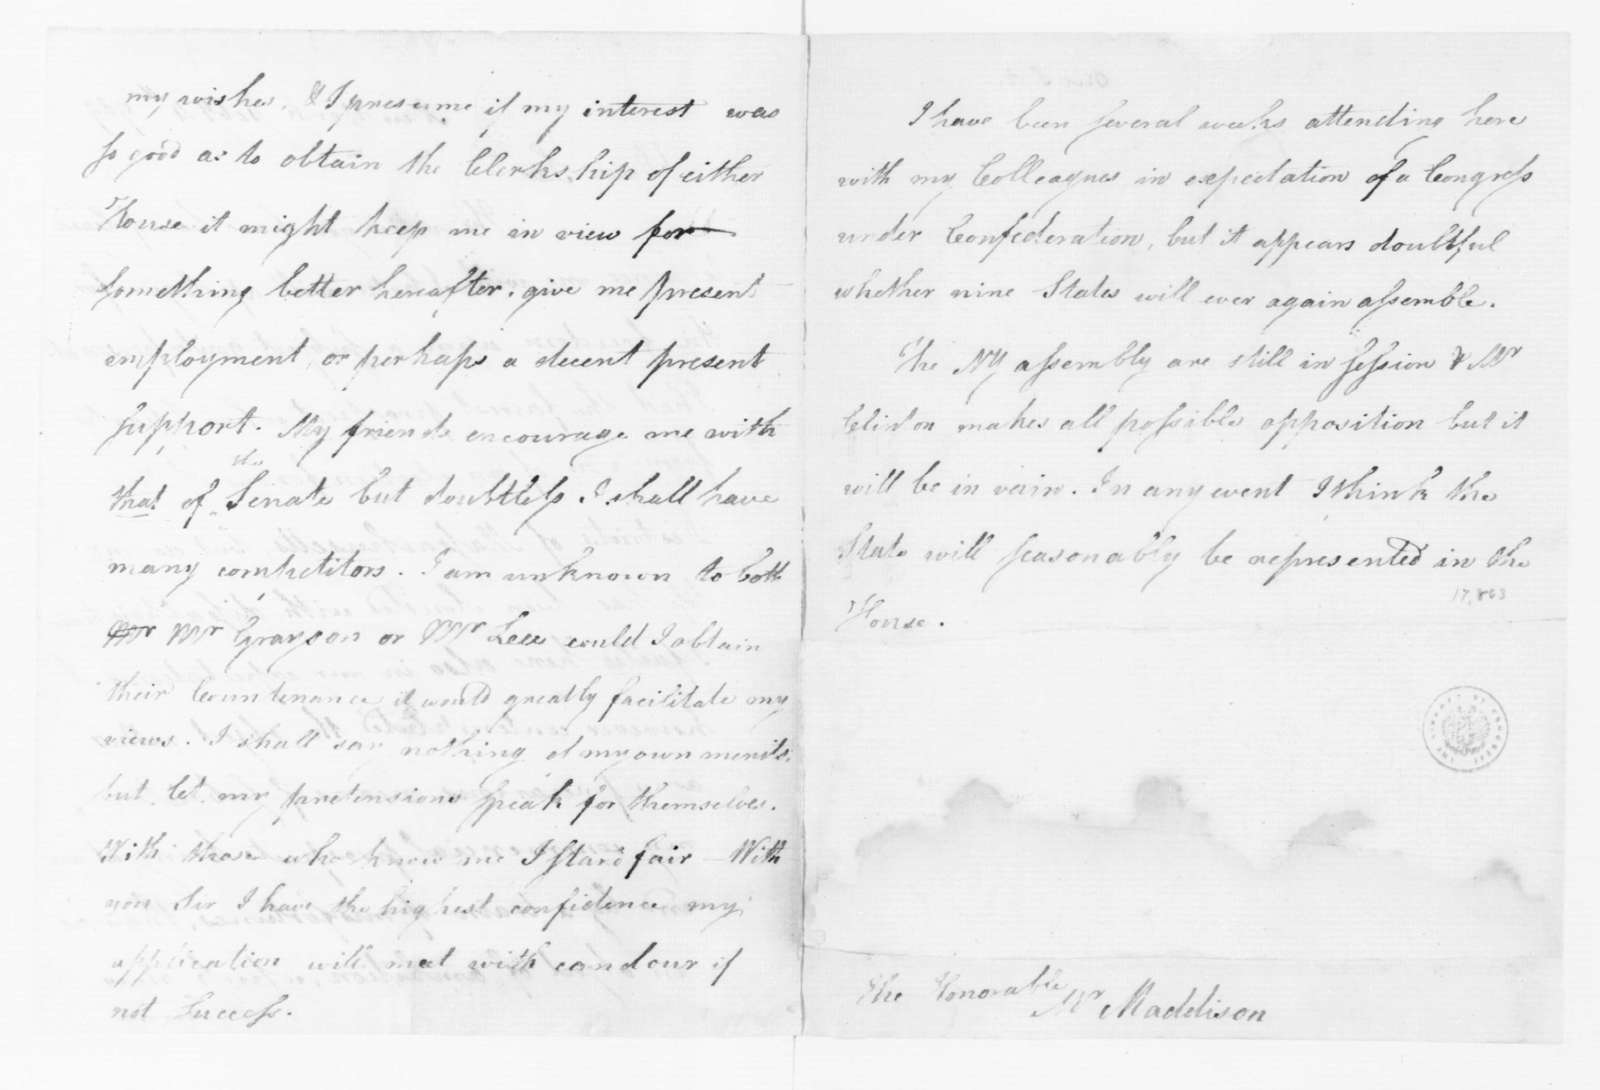 Samuel A. Otis to James Madison, February 4, 1789.